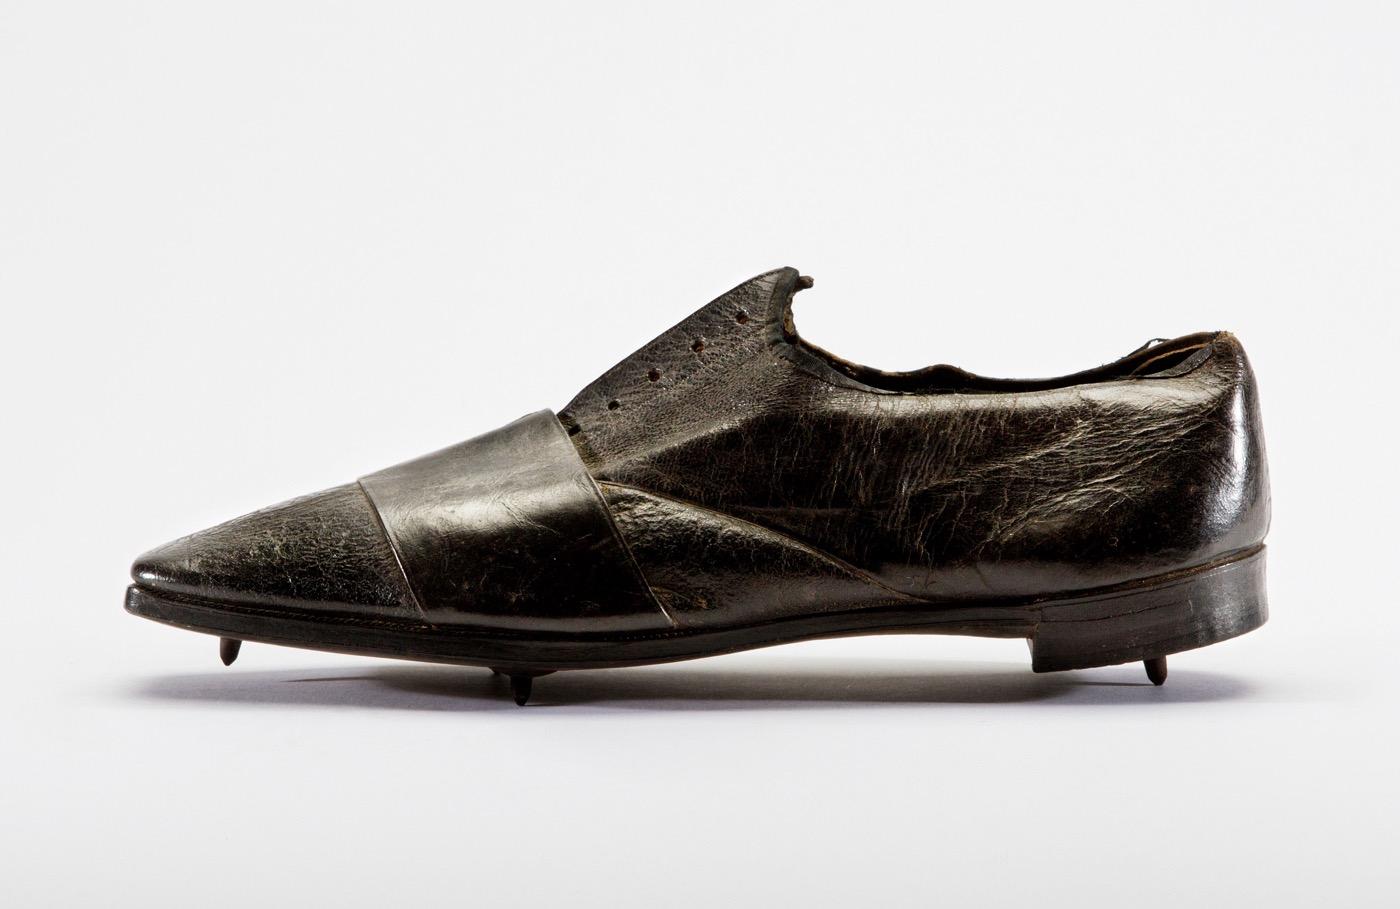 7e08a00b66405 Olympics Shoes The Italian To Go A354jLR